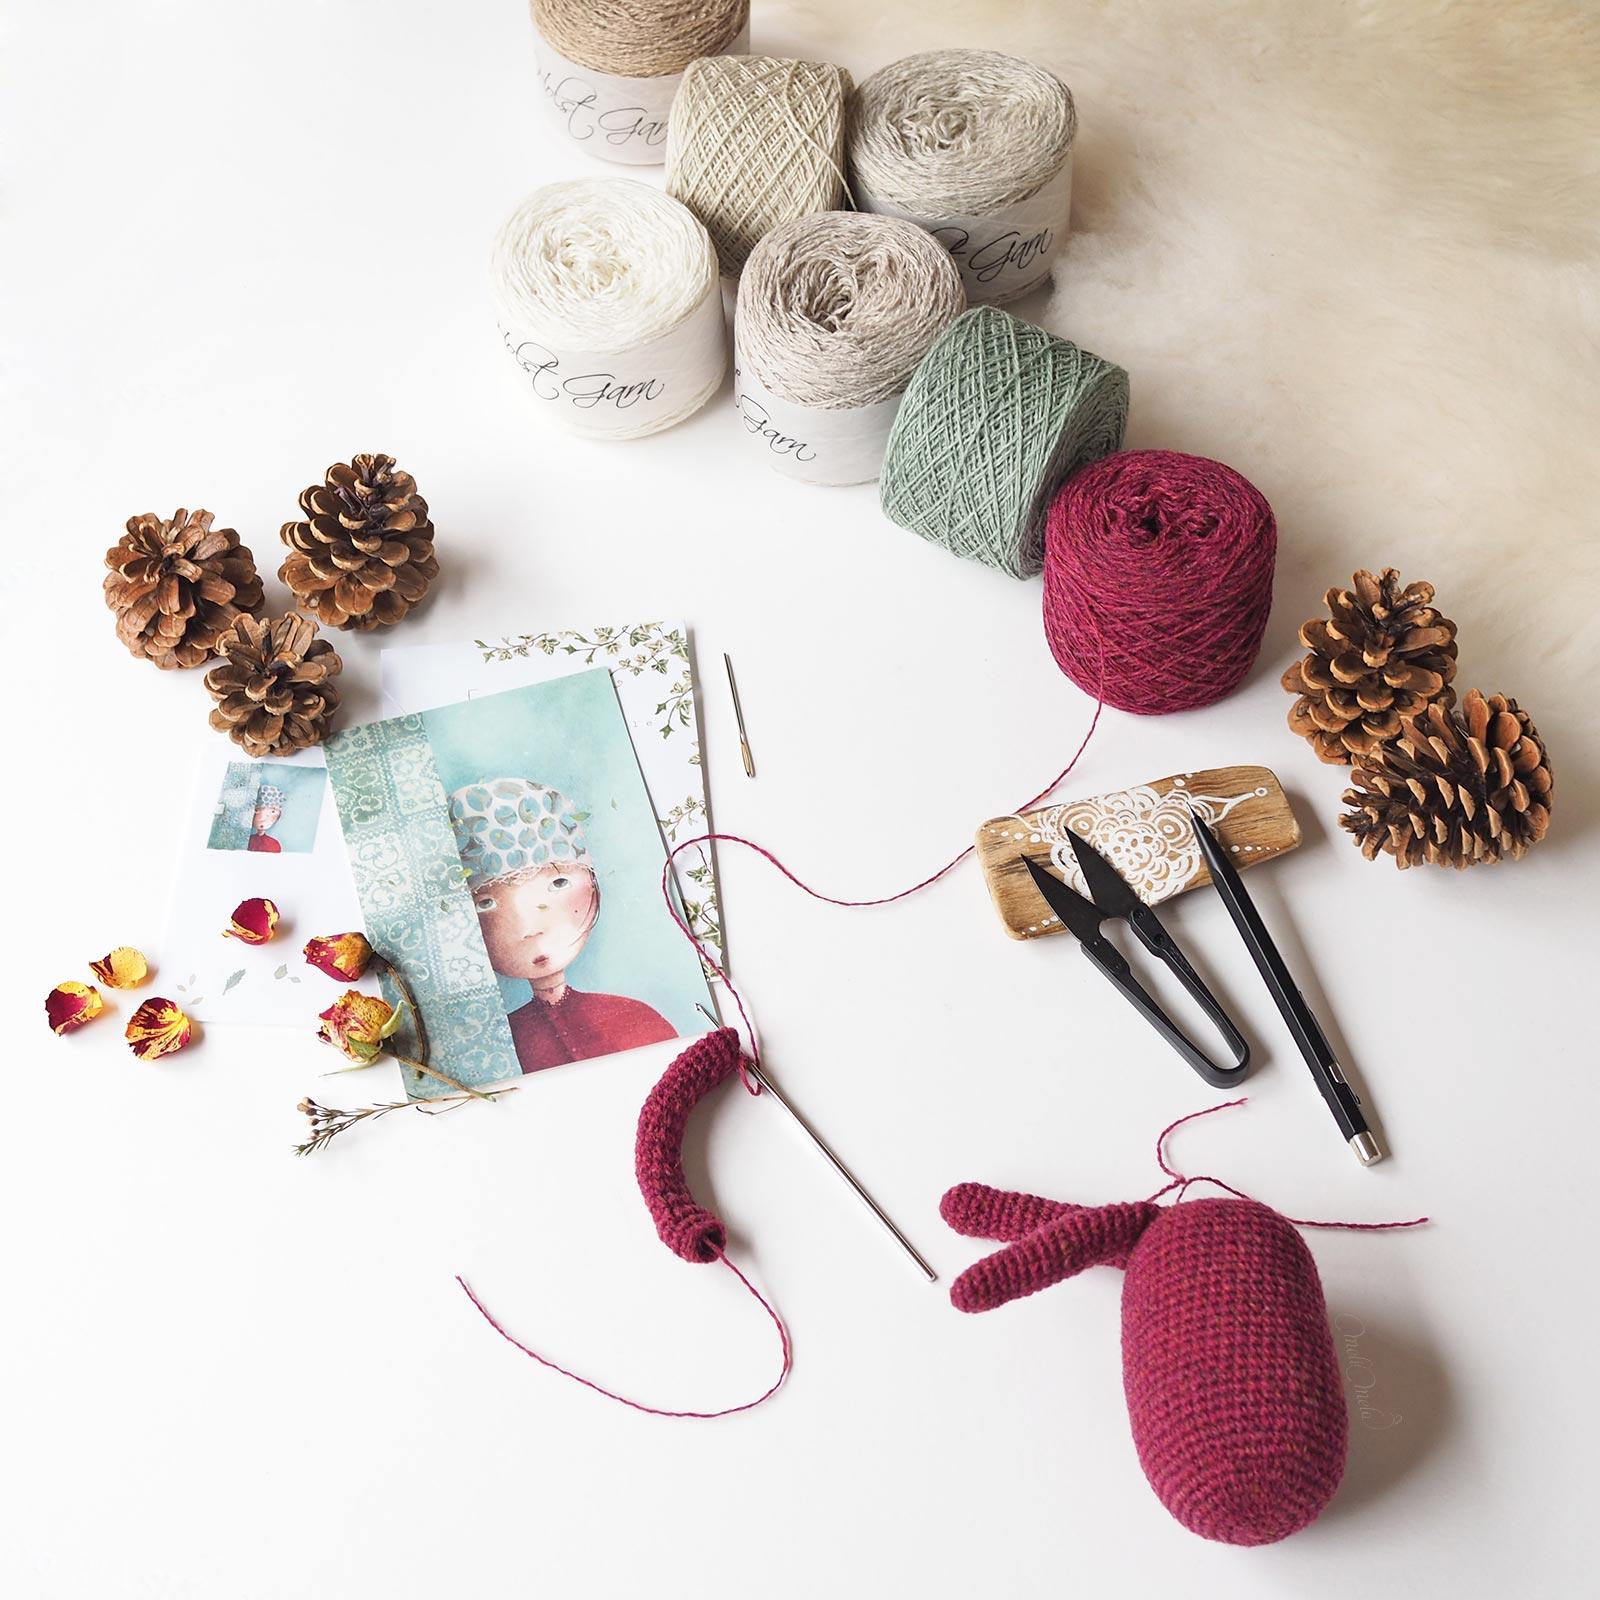 crochet elfe pins encours inspiration poème Cicely Mary Barker créations mignonneries laboutiquedemelimelo